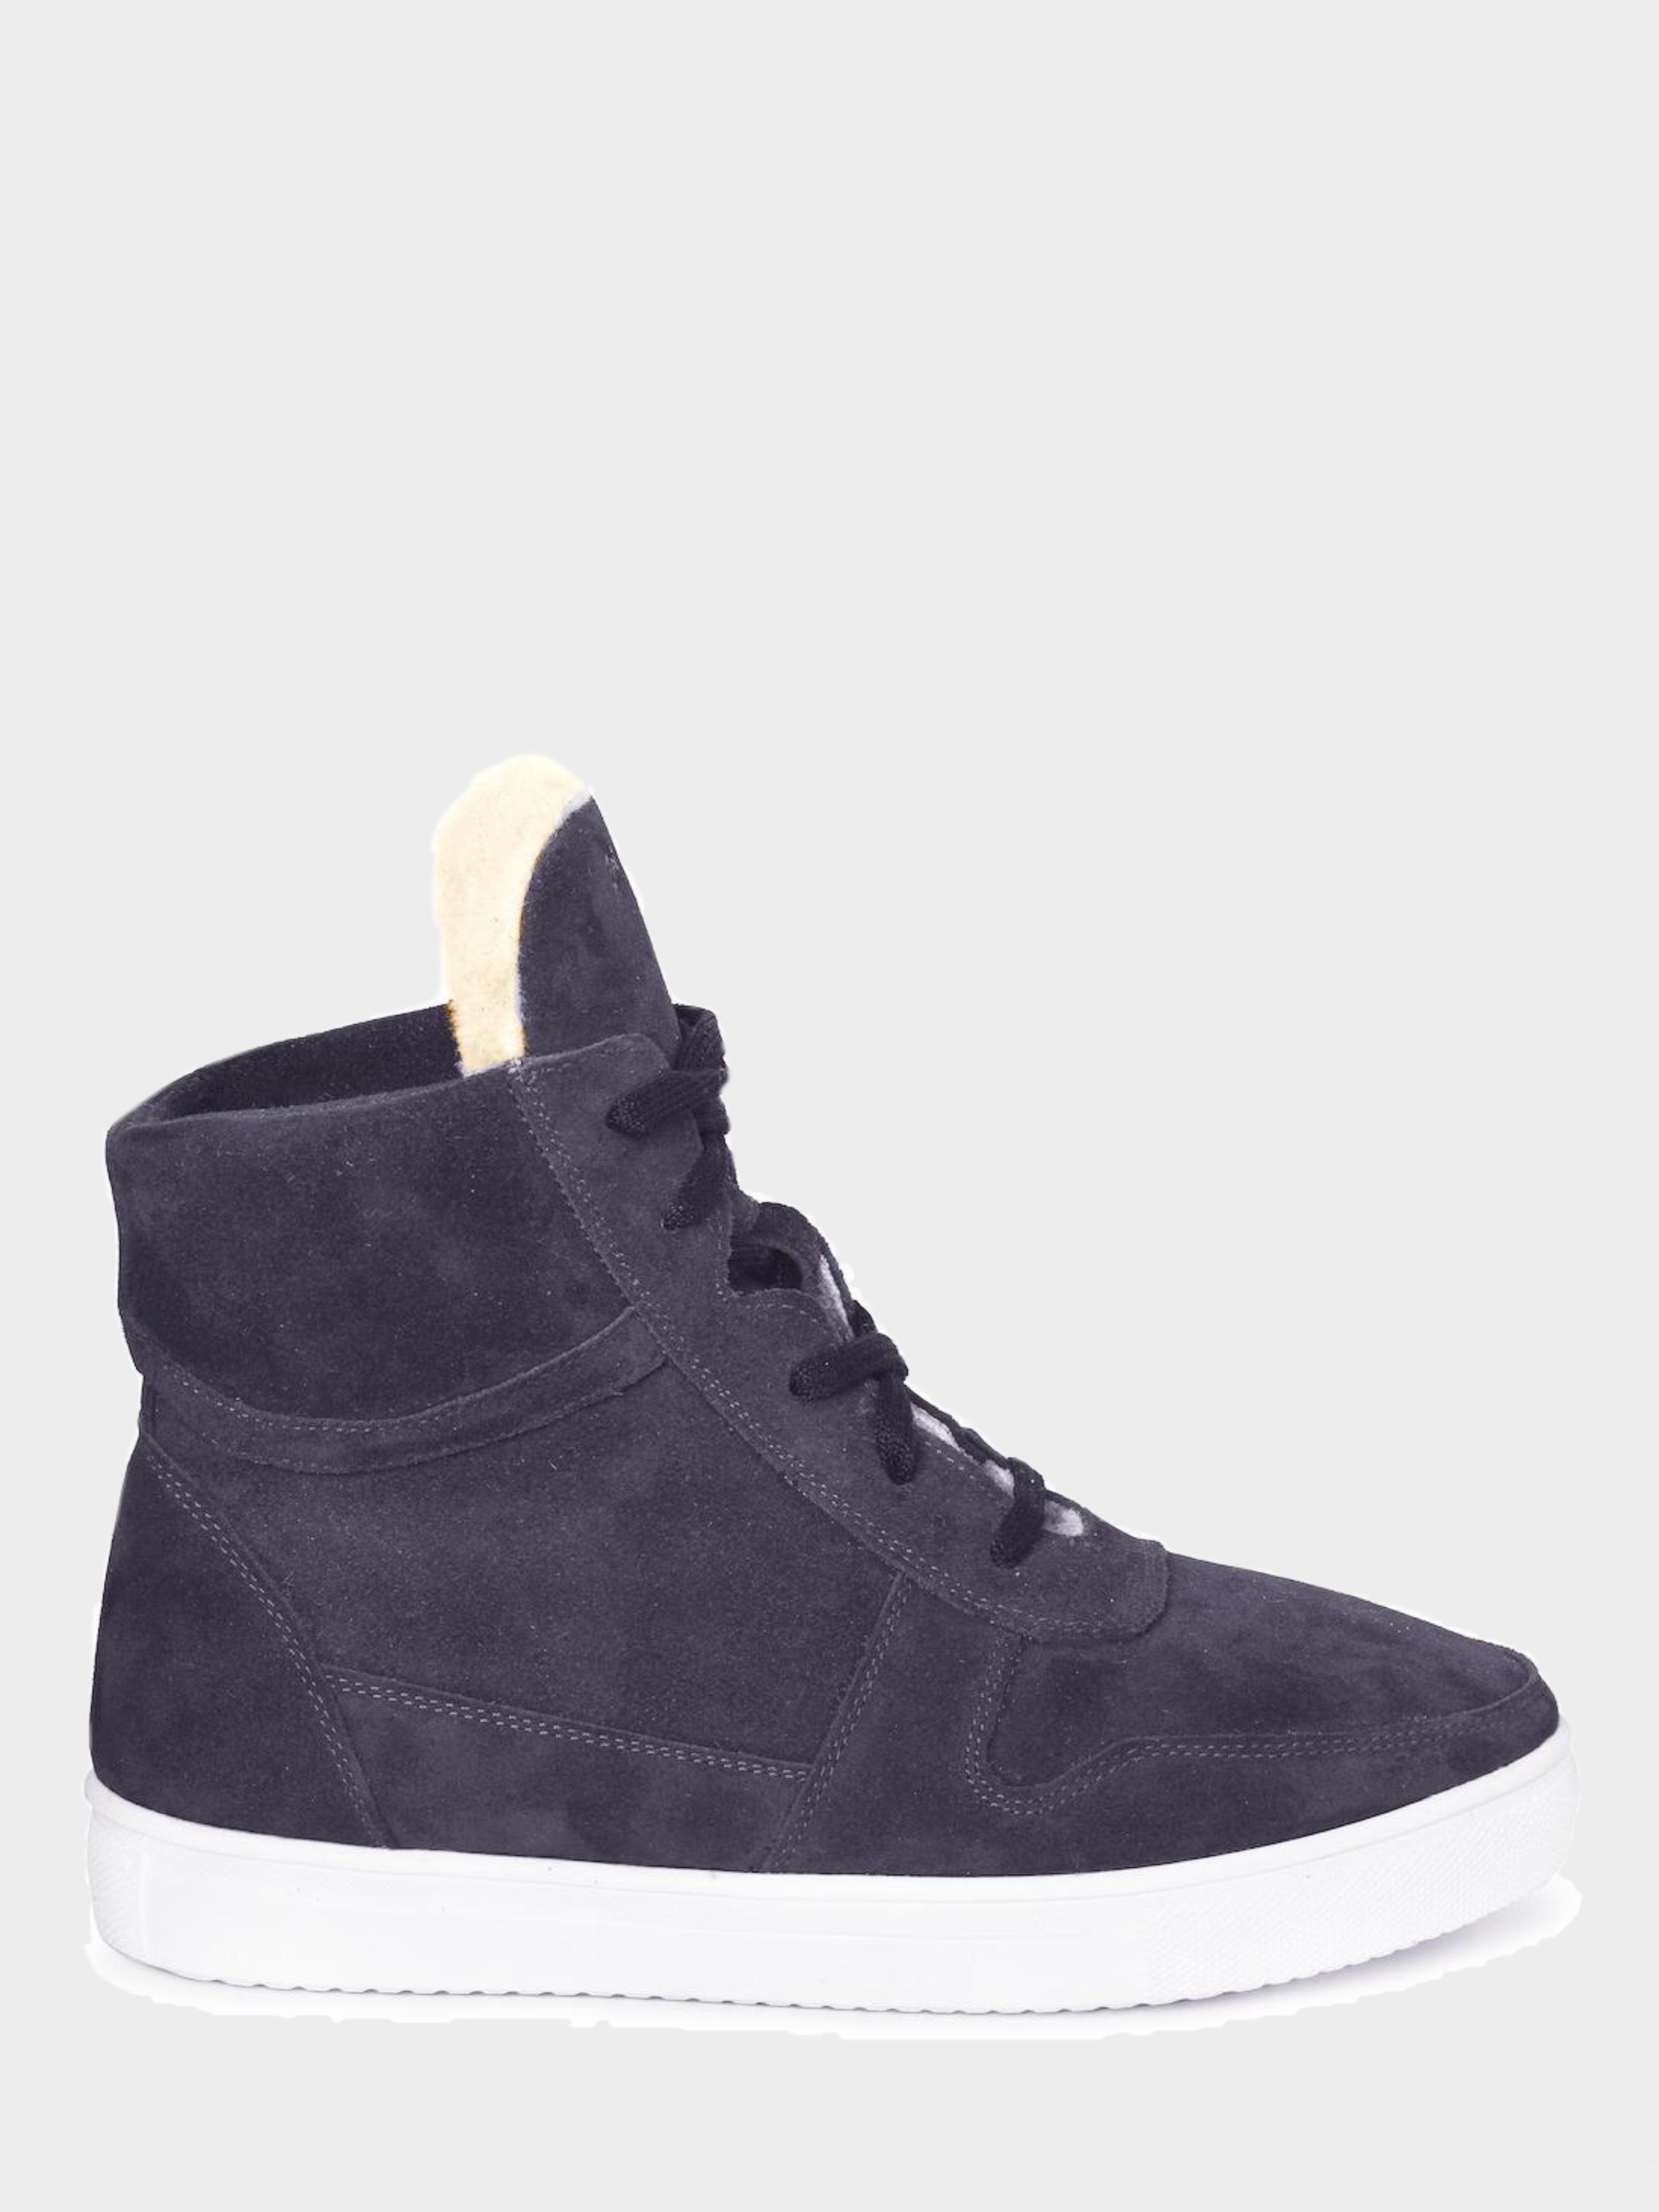 GRACE / Ботинки женские Ботинки  на  меху H2 H2.2.000000335